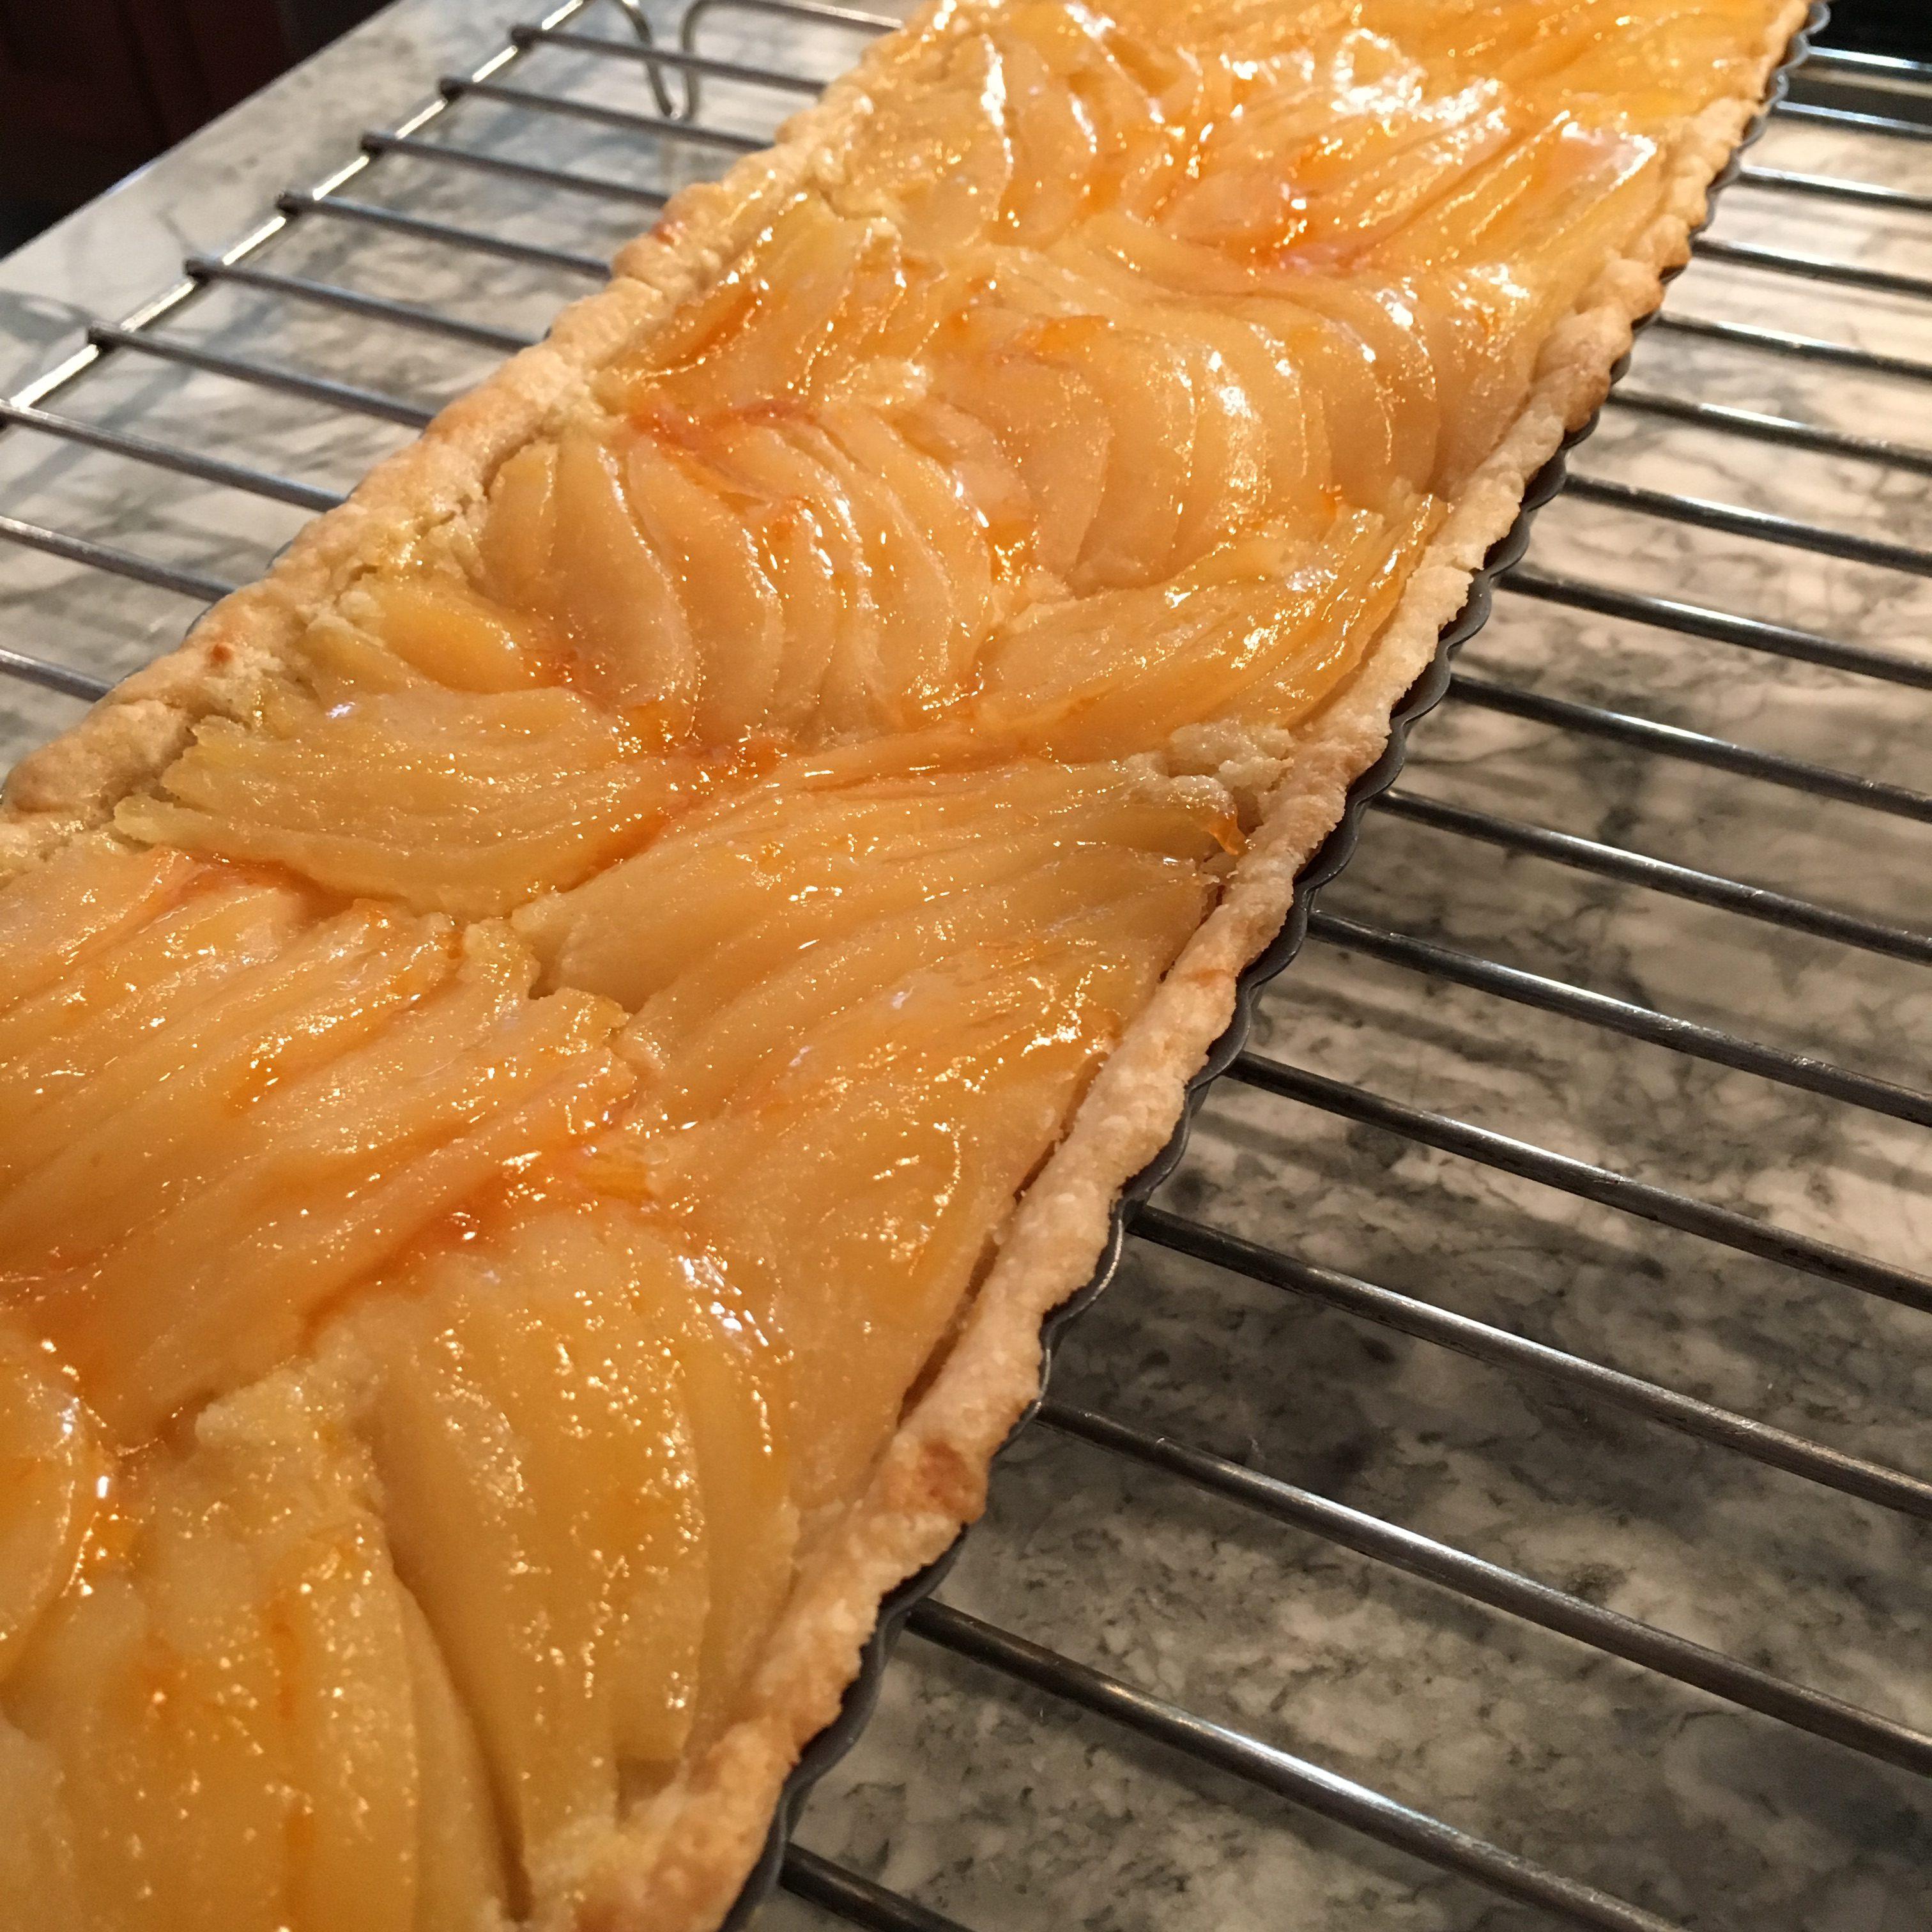 Kathy's Pear Almond Tart